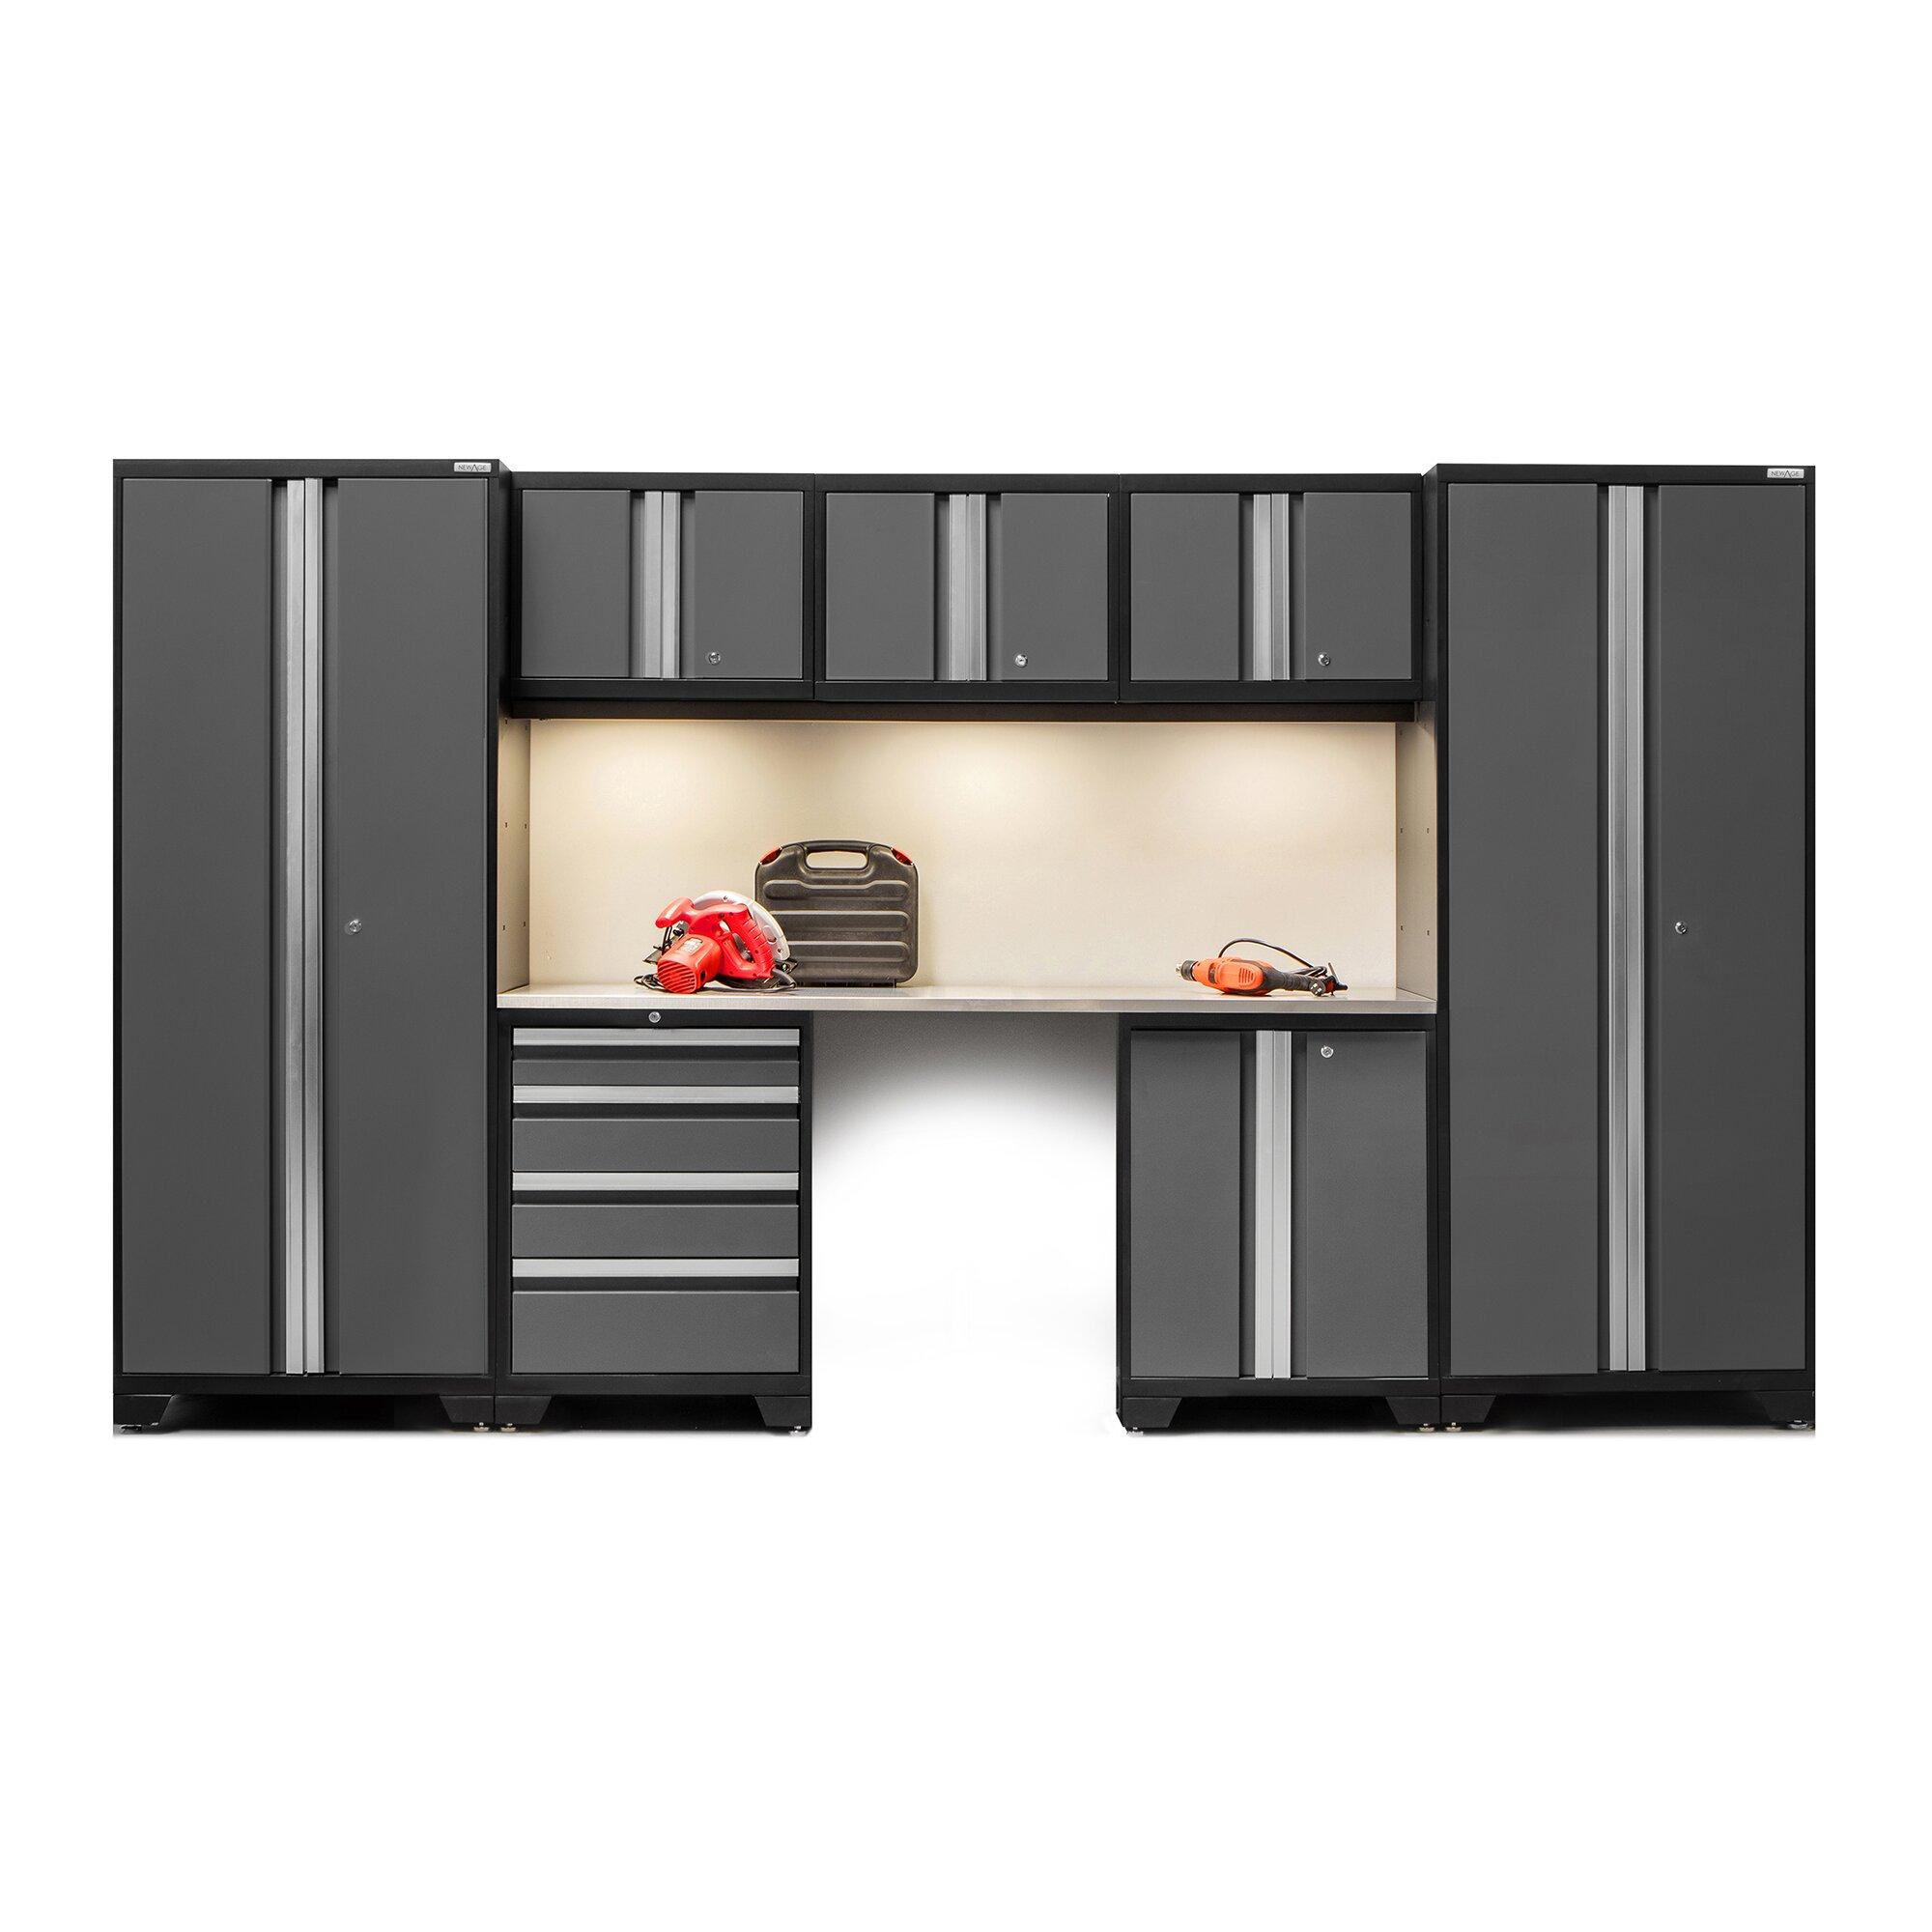 Wall Of Storage Cabinets Newage Products Bold 30 Series 8 Piece Garage Storage Cabinet Set